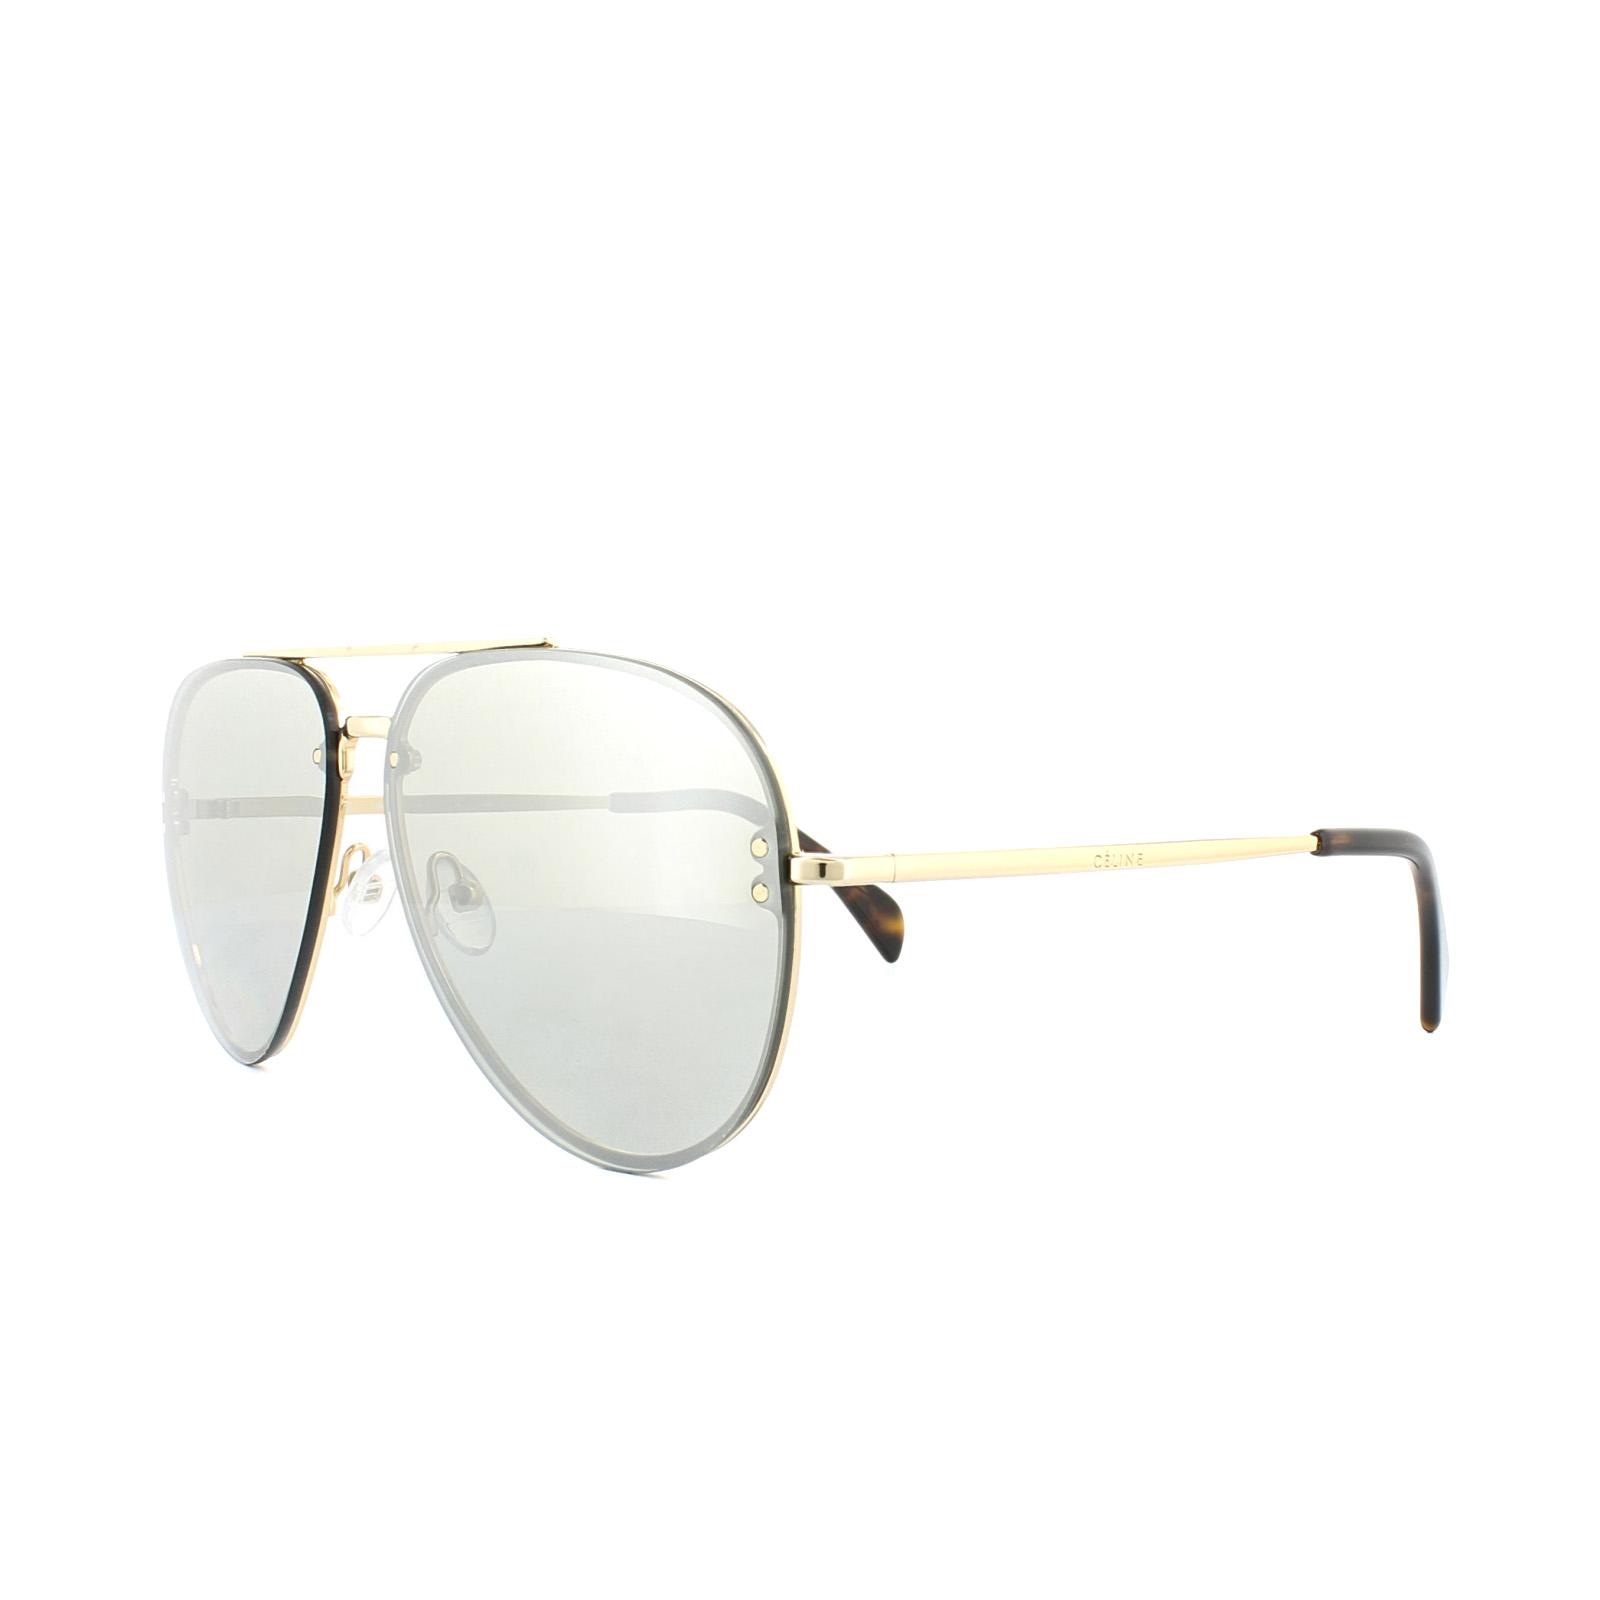 6f443ba1823 Sentinel Celine Sunglasses 41391 S Mirror J5G SS Gold Grey Silver Mirror